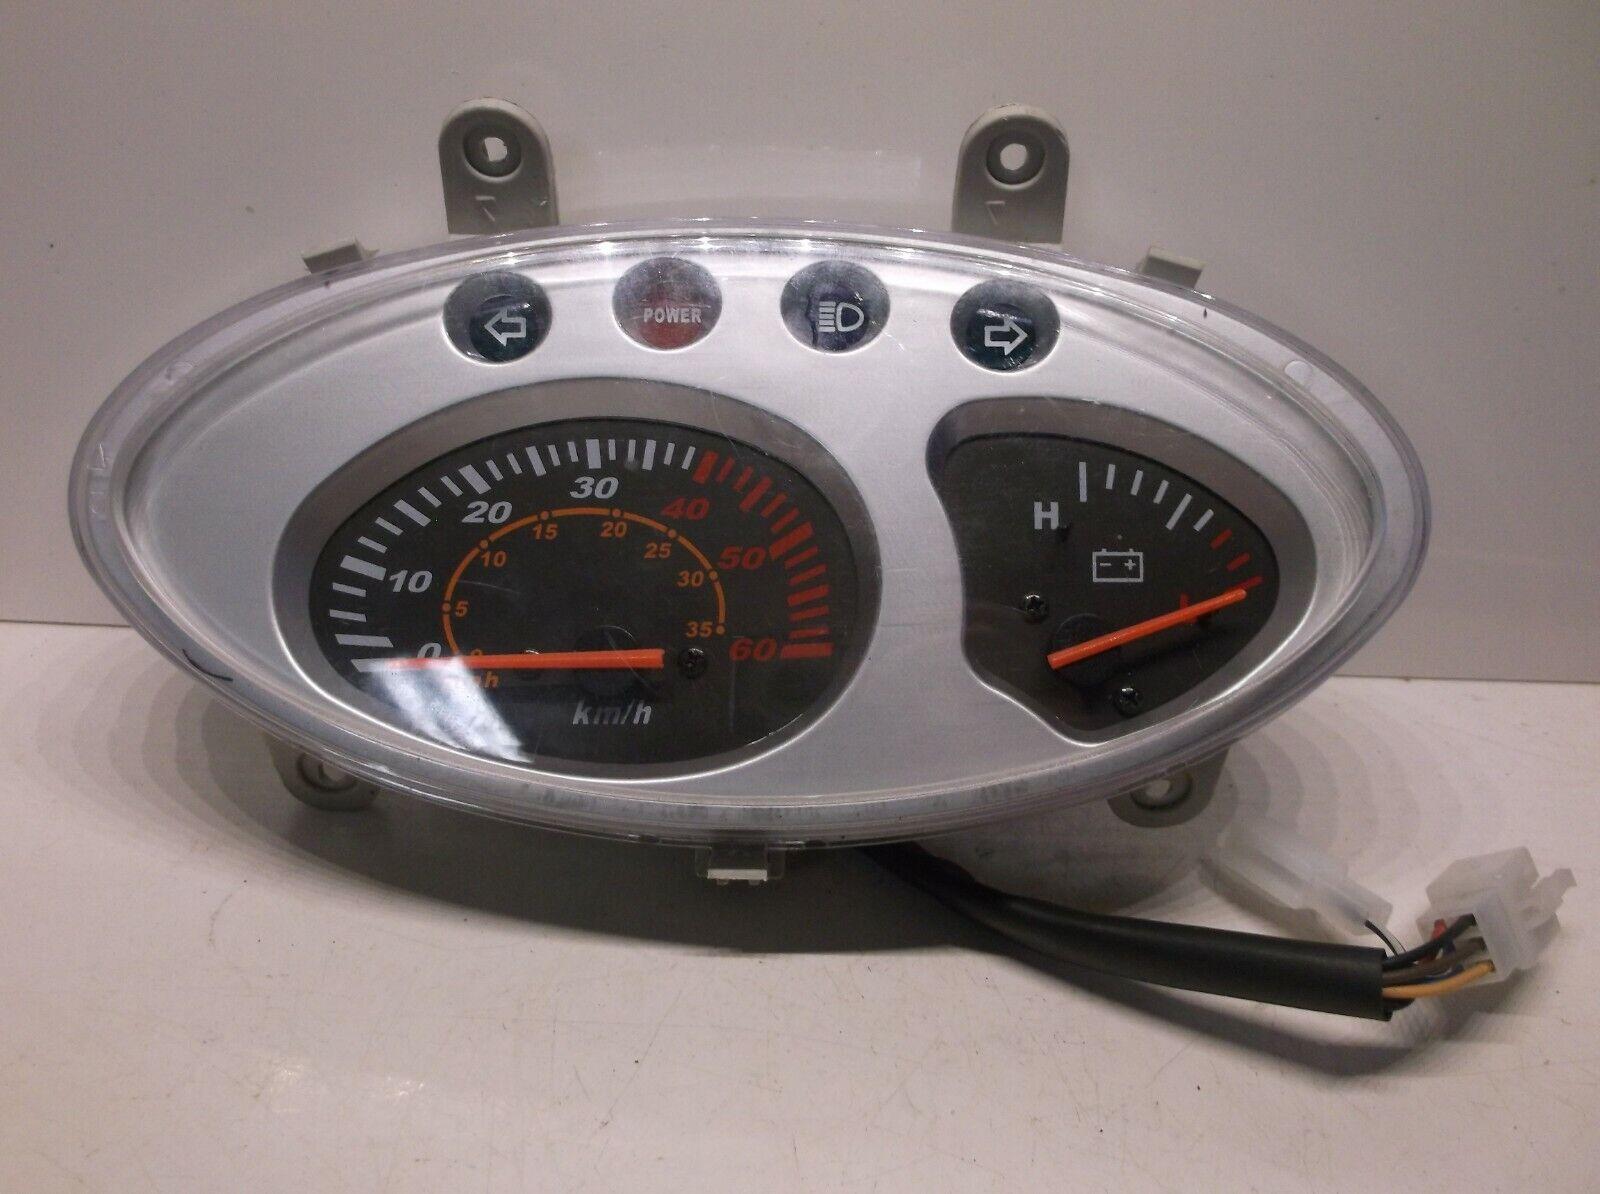 Montana 48V racimo del instrumento medidor